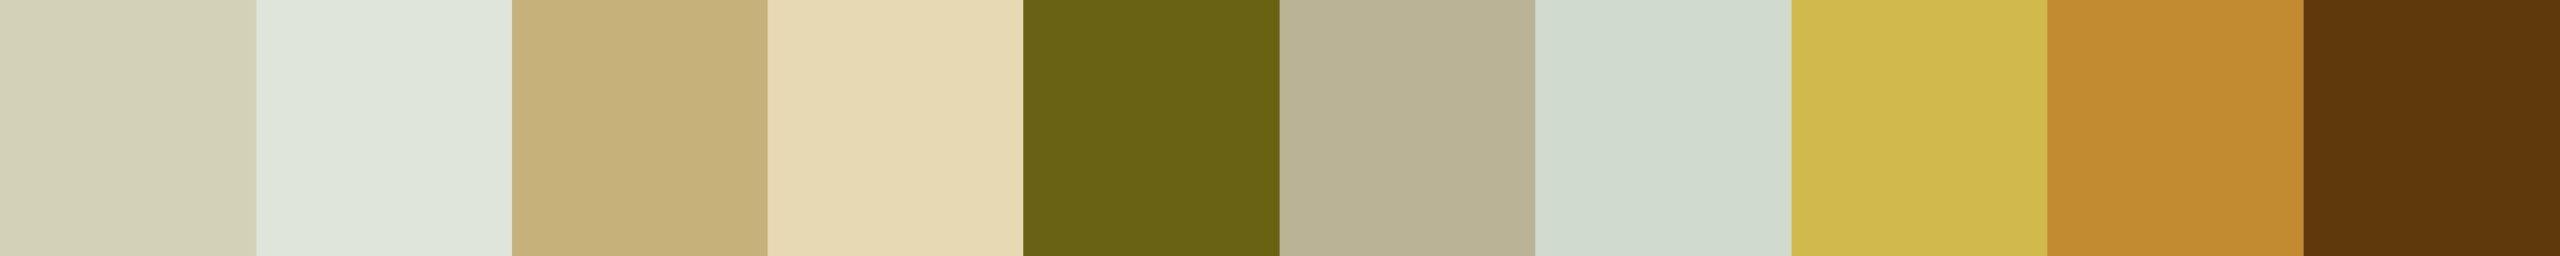 604 Detroza Color Palette